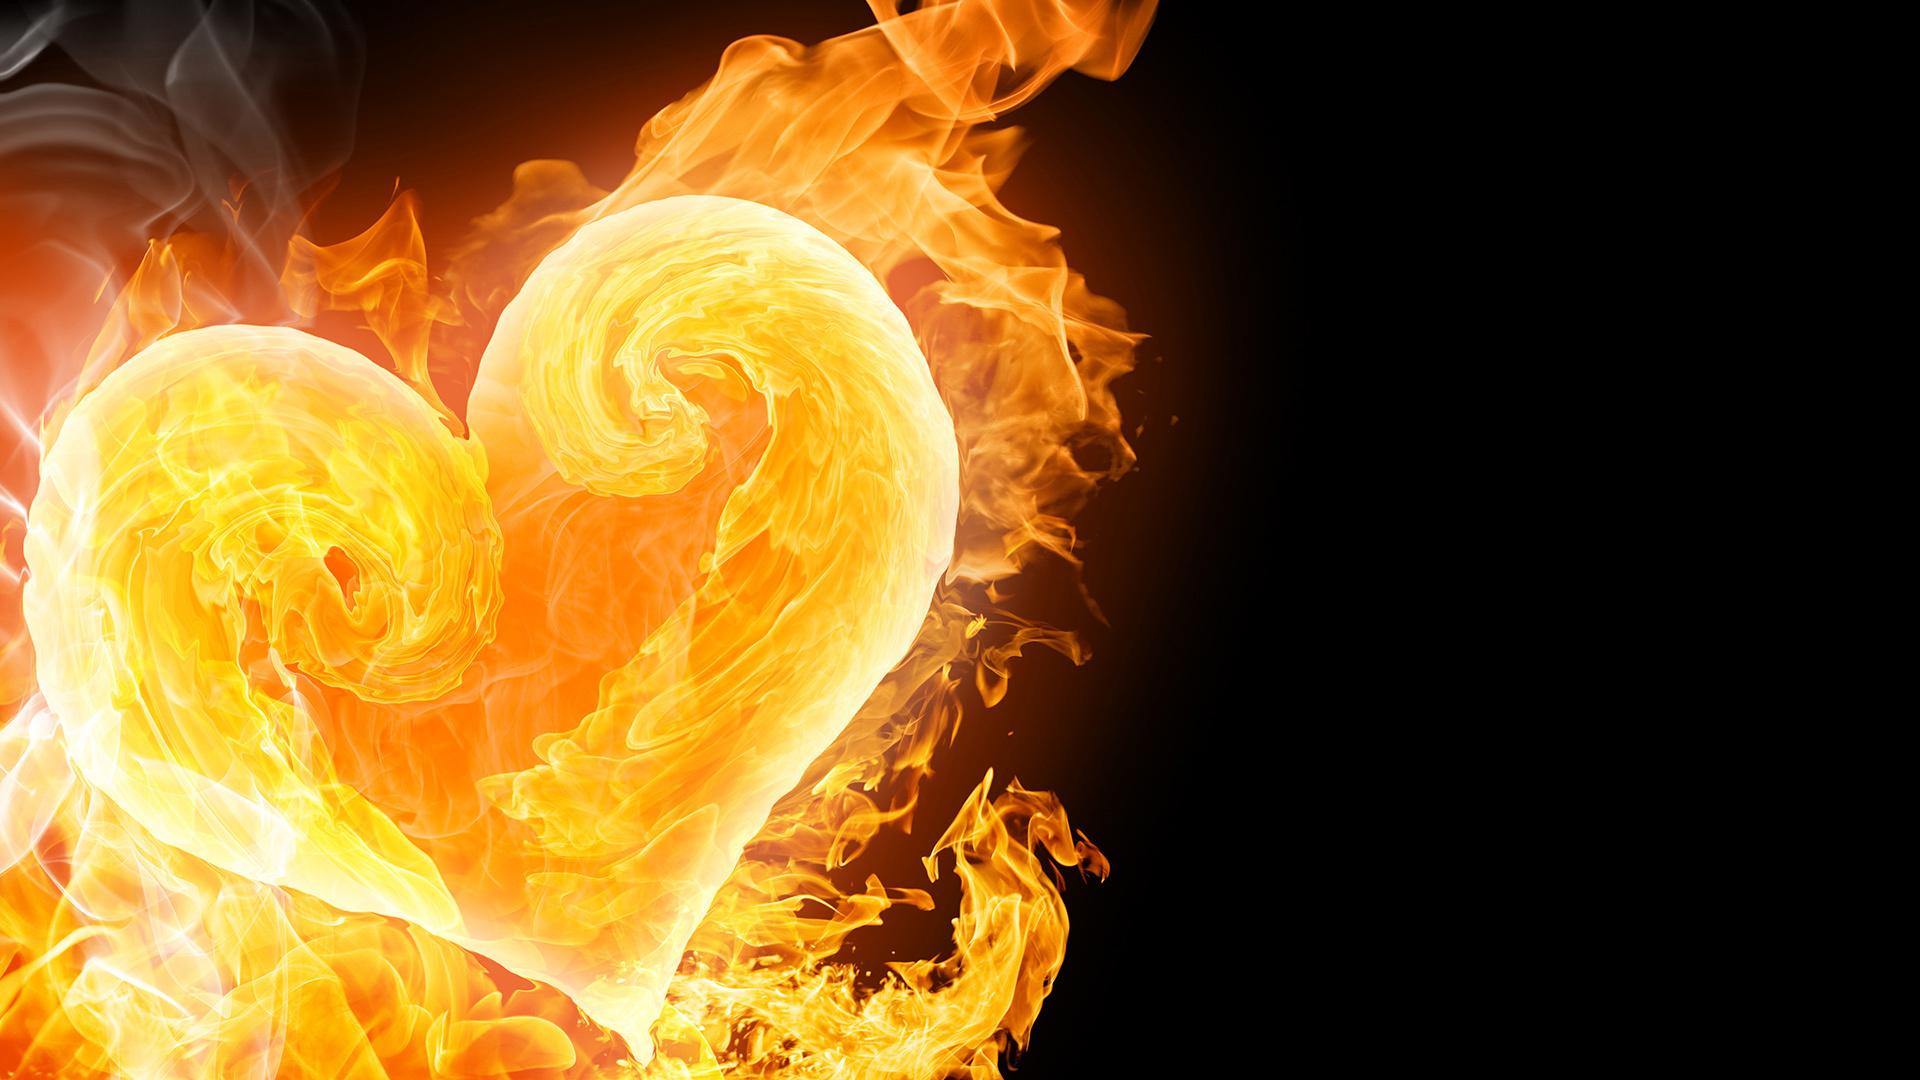 DayBreaks for 01/24/13 – Discovering Fire | DayBreaks Devotions